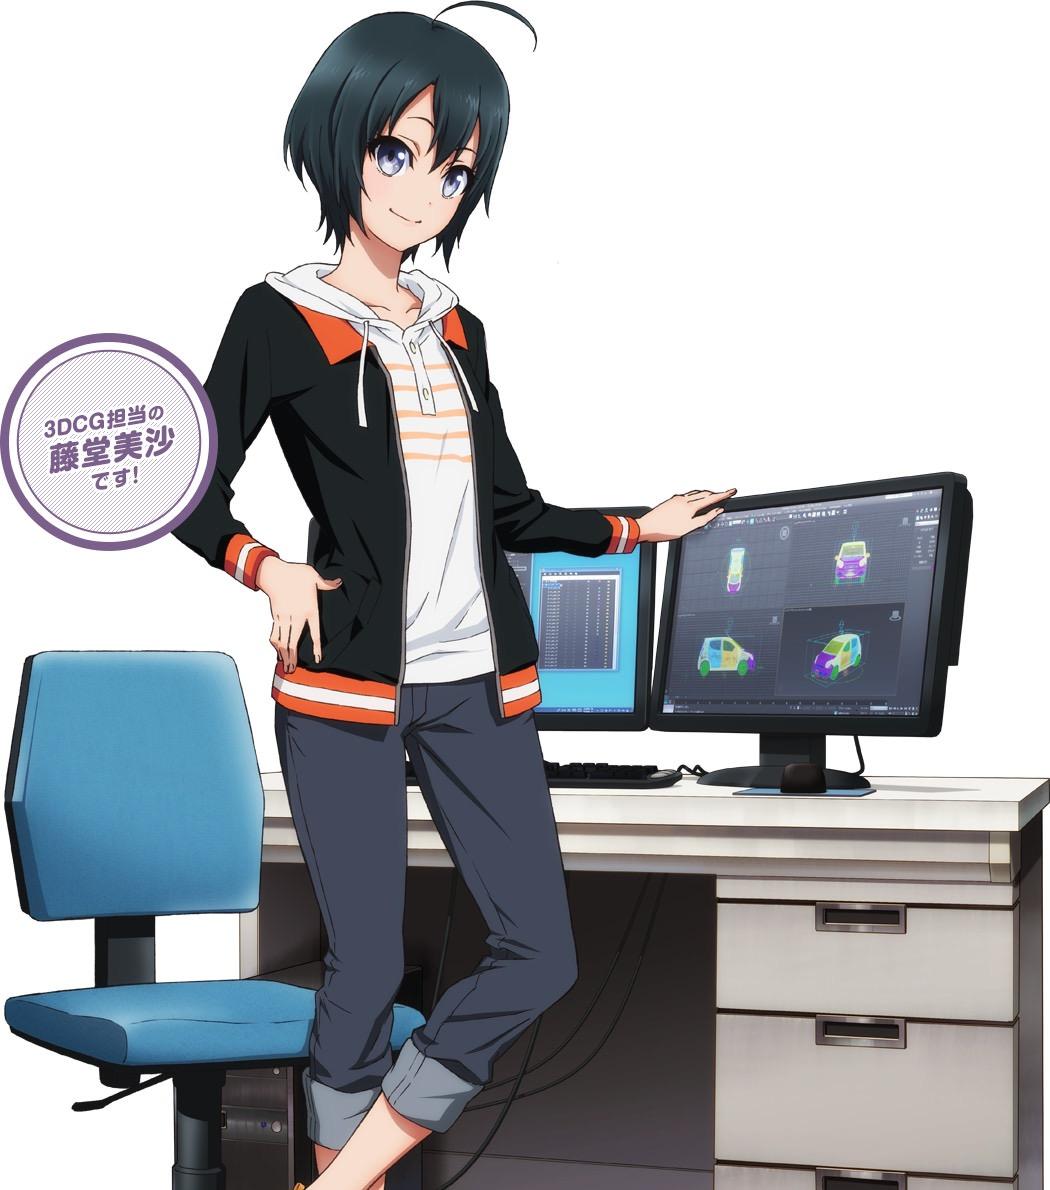 SHIROBAKOの画像 p1_30